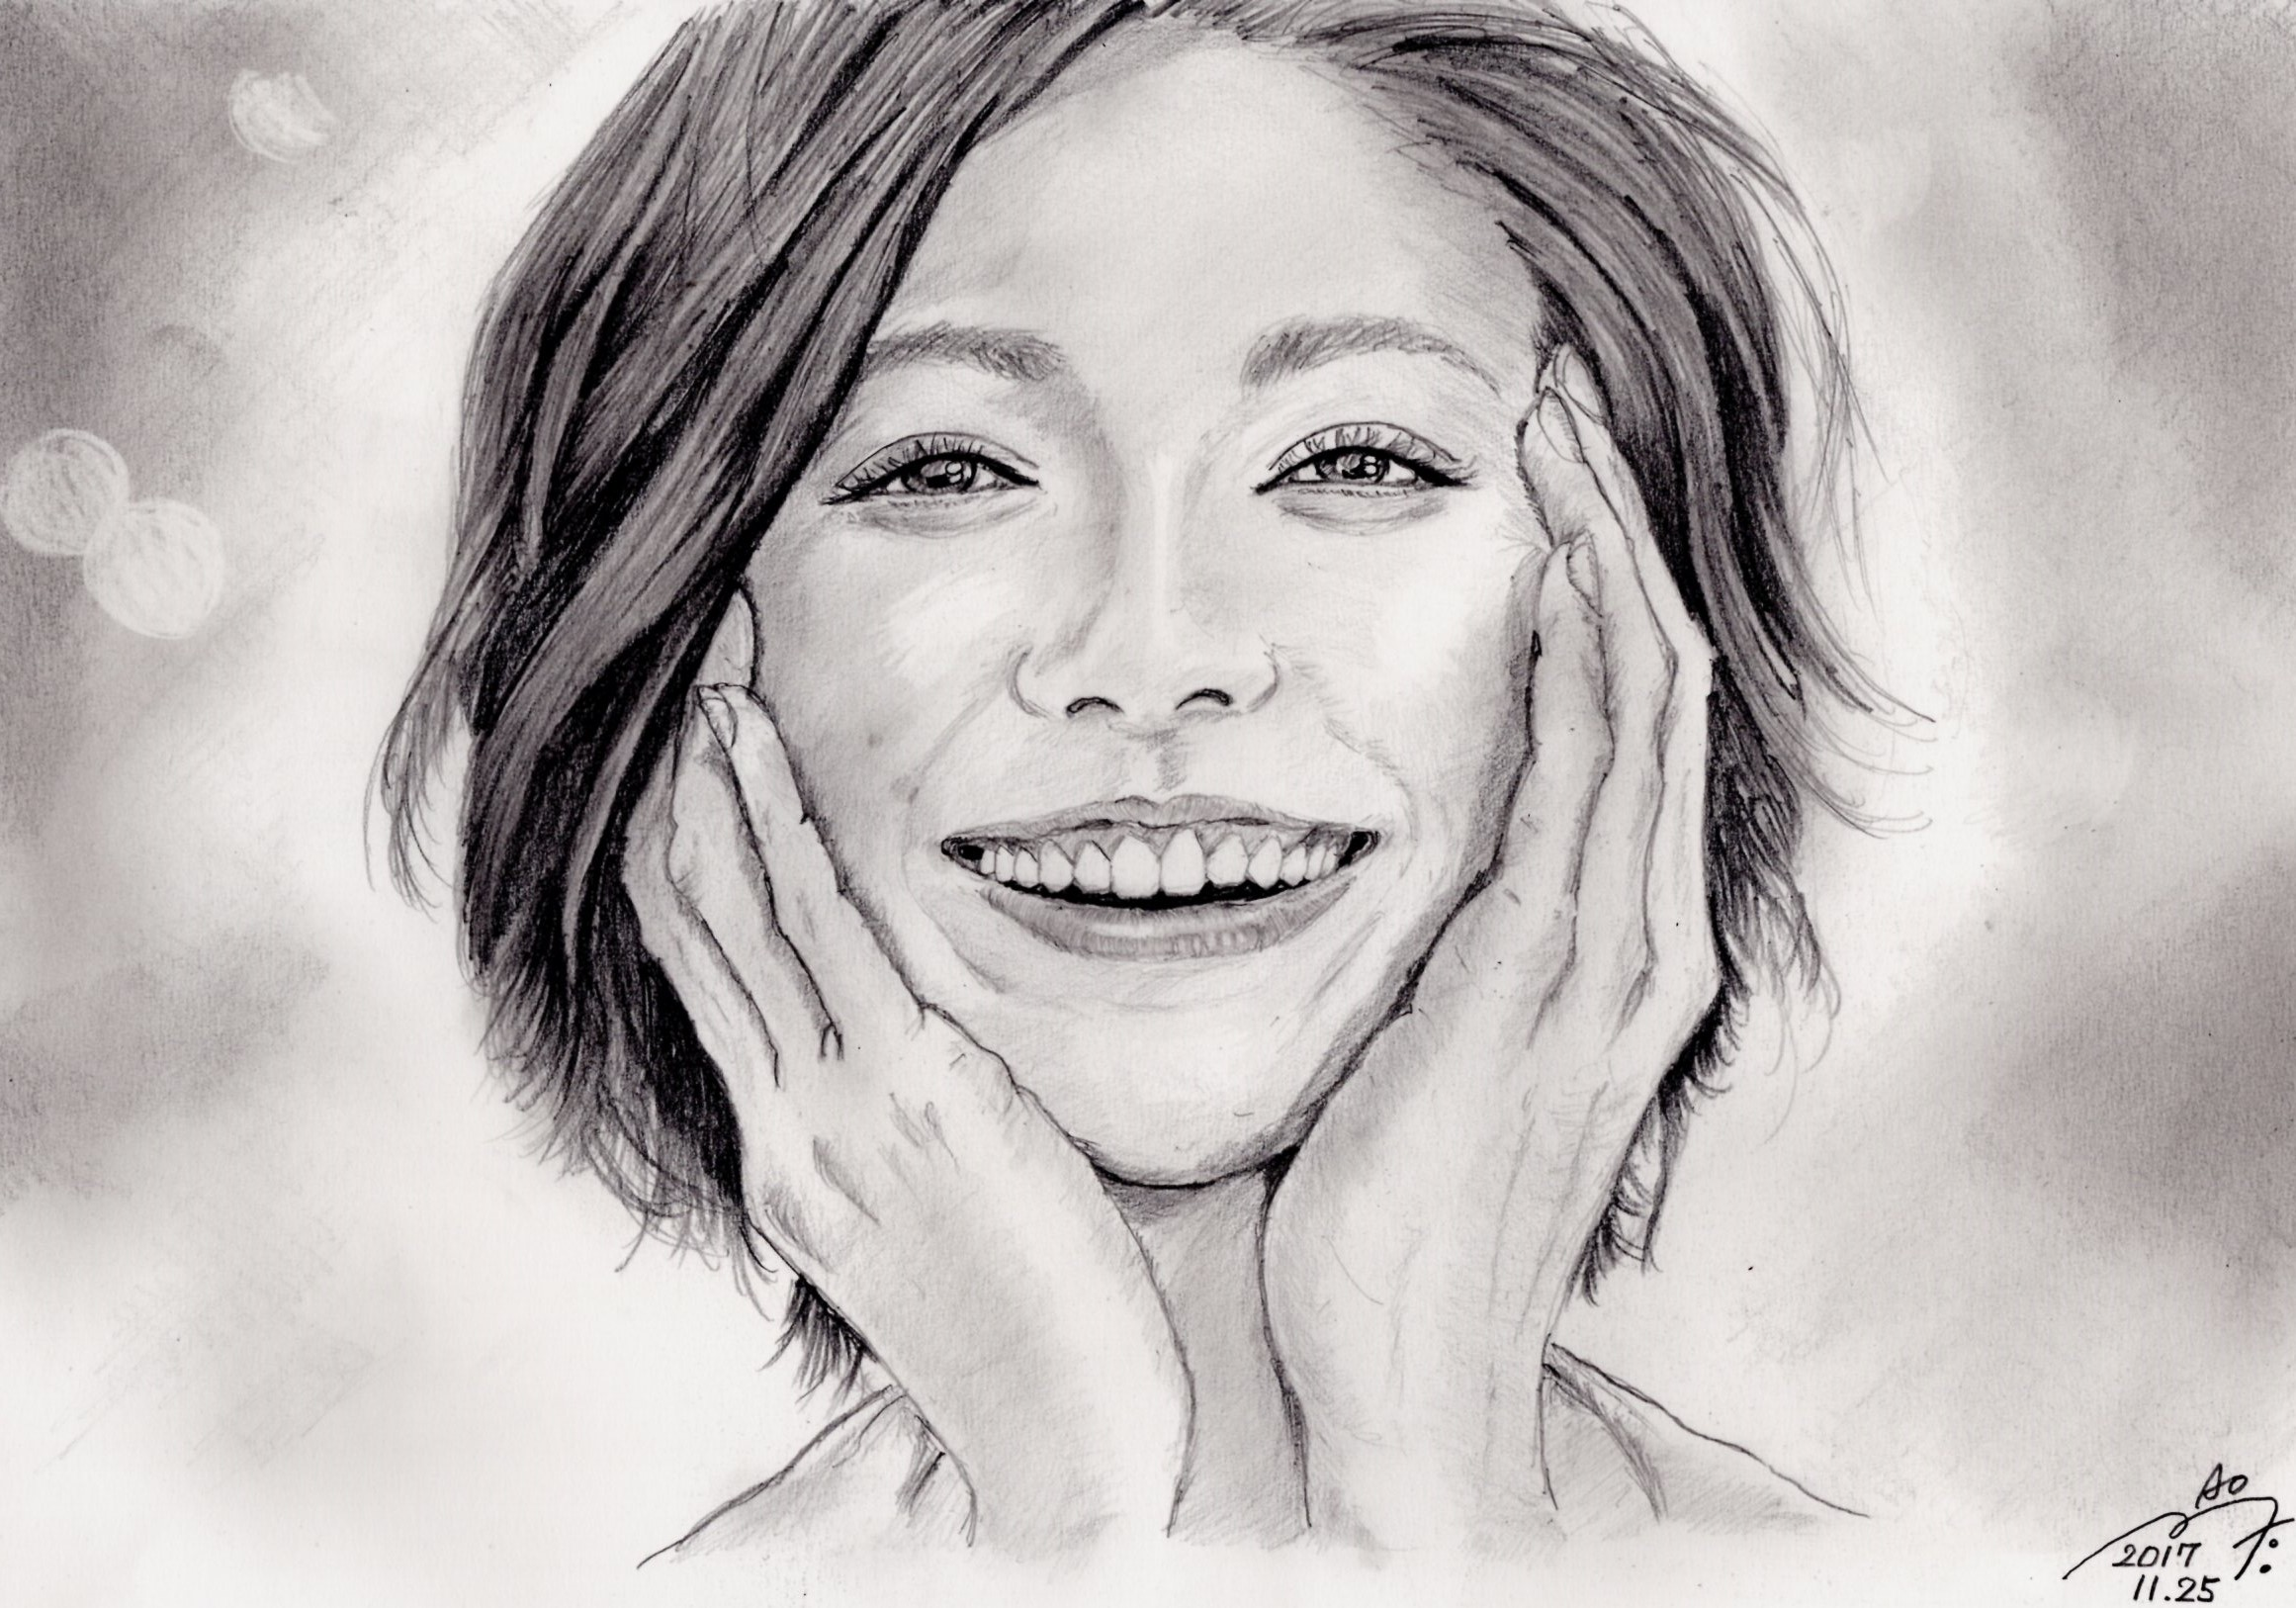 松下奈緒の鉛筆画似顔絵